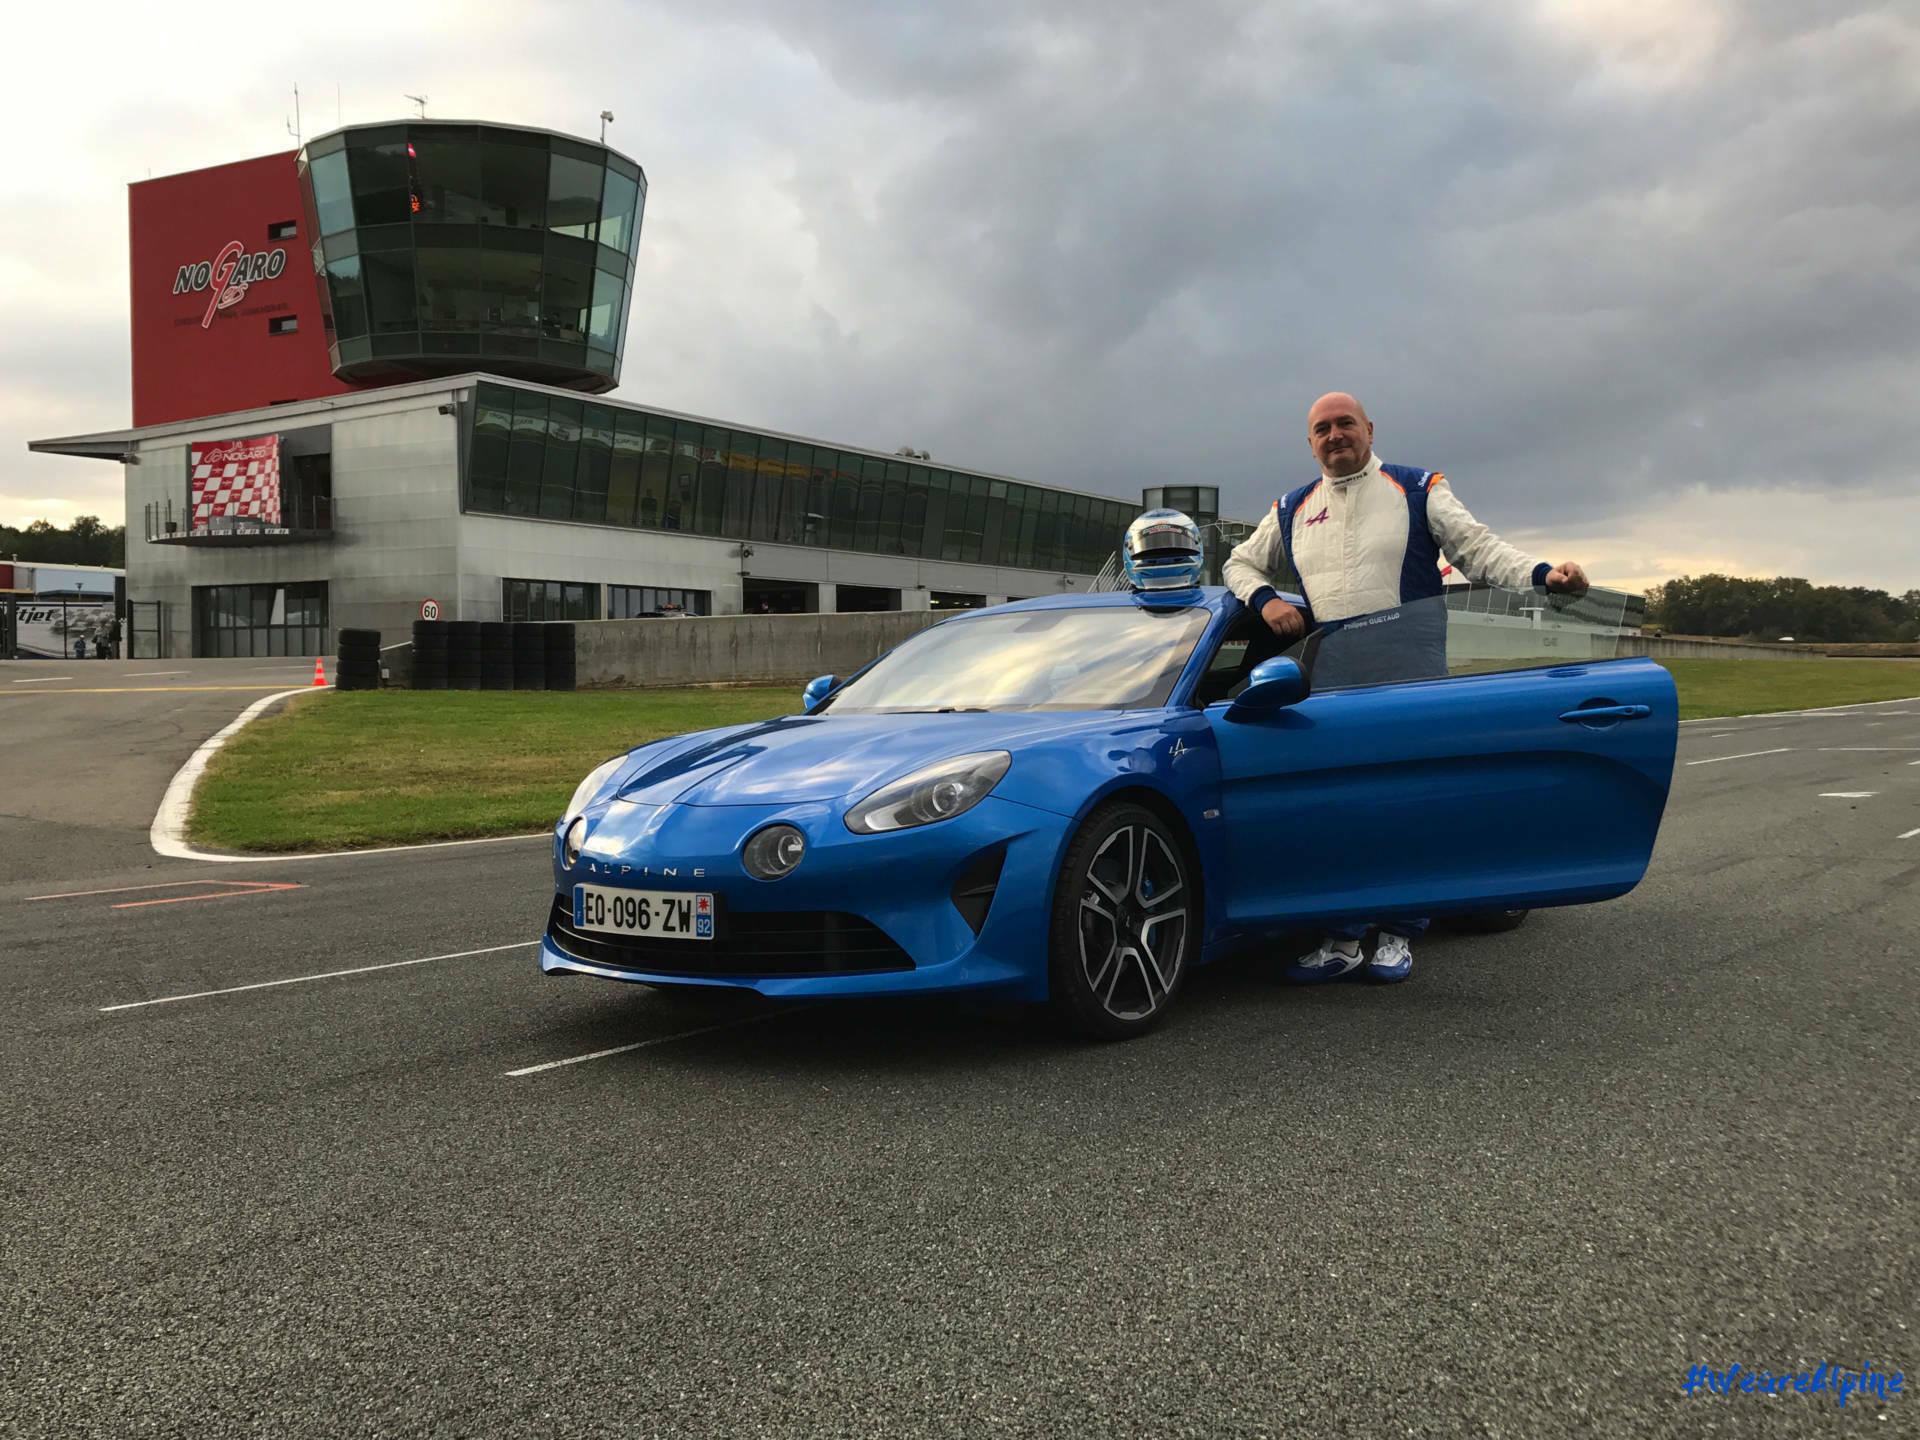 Alpine A110 2017 Philippe Quetaud Circuit Nogaro Première immatriculation 1 | La première Alpine A110 immatriculée sur le circuit de Nogaro !